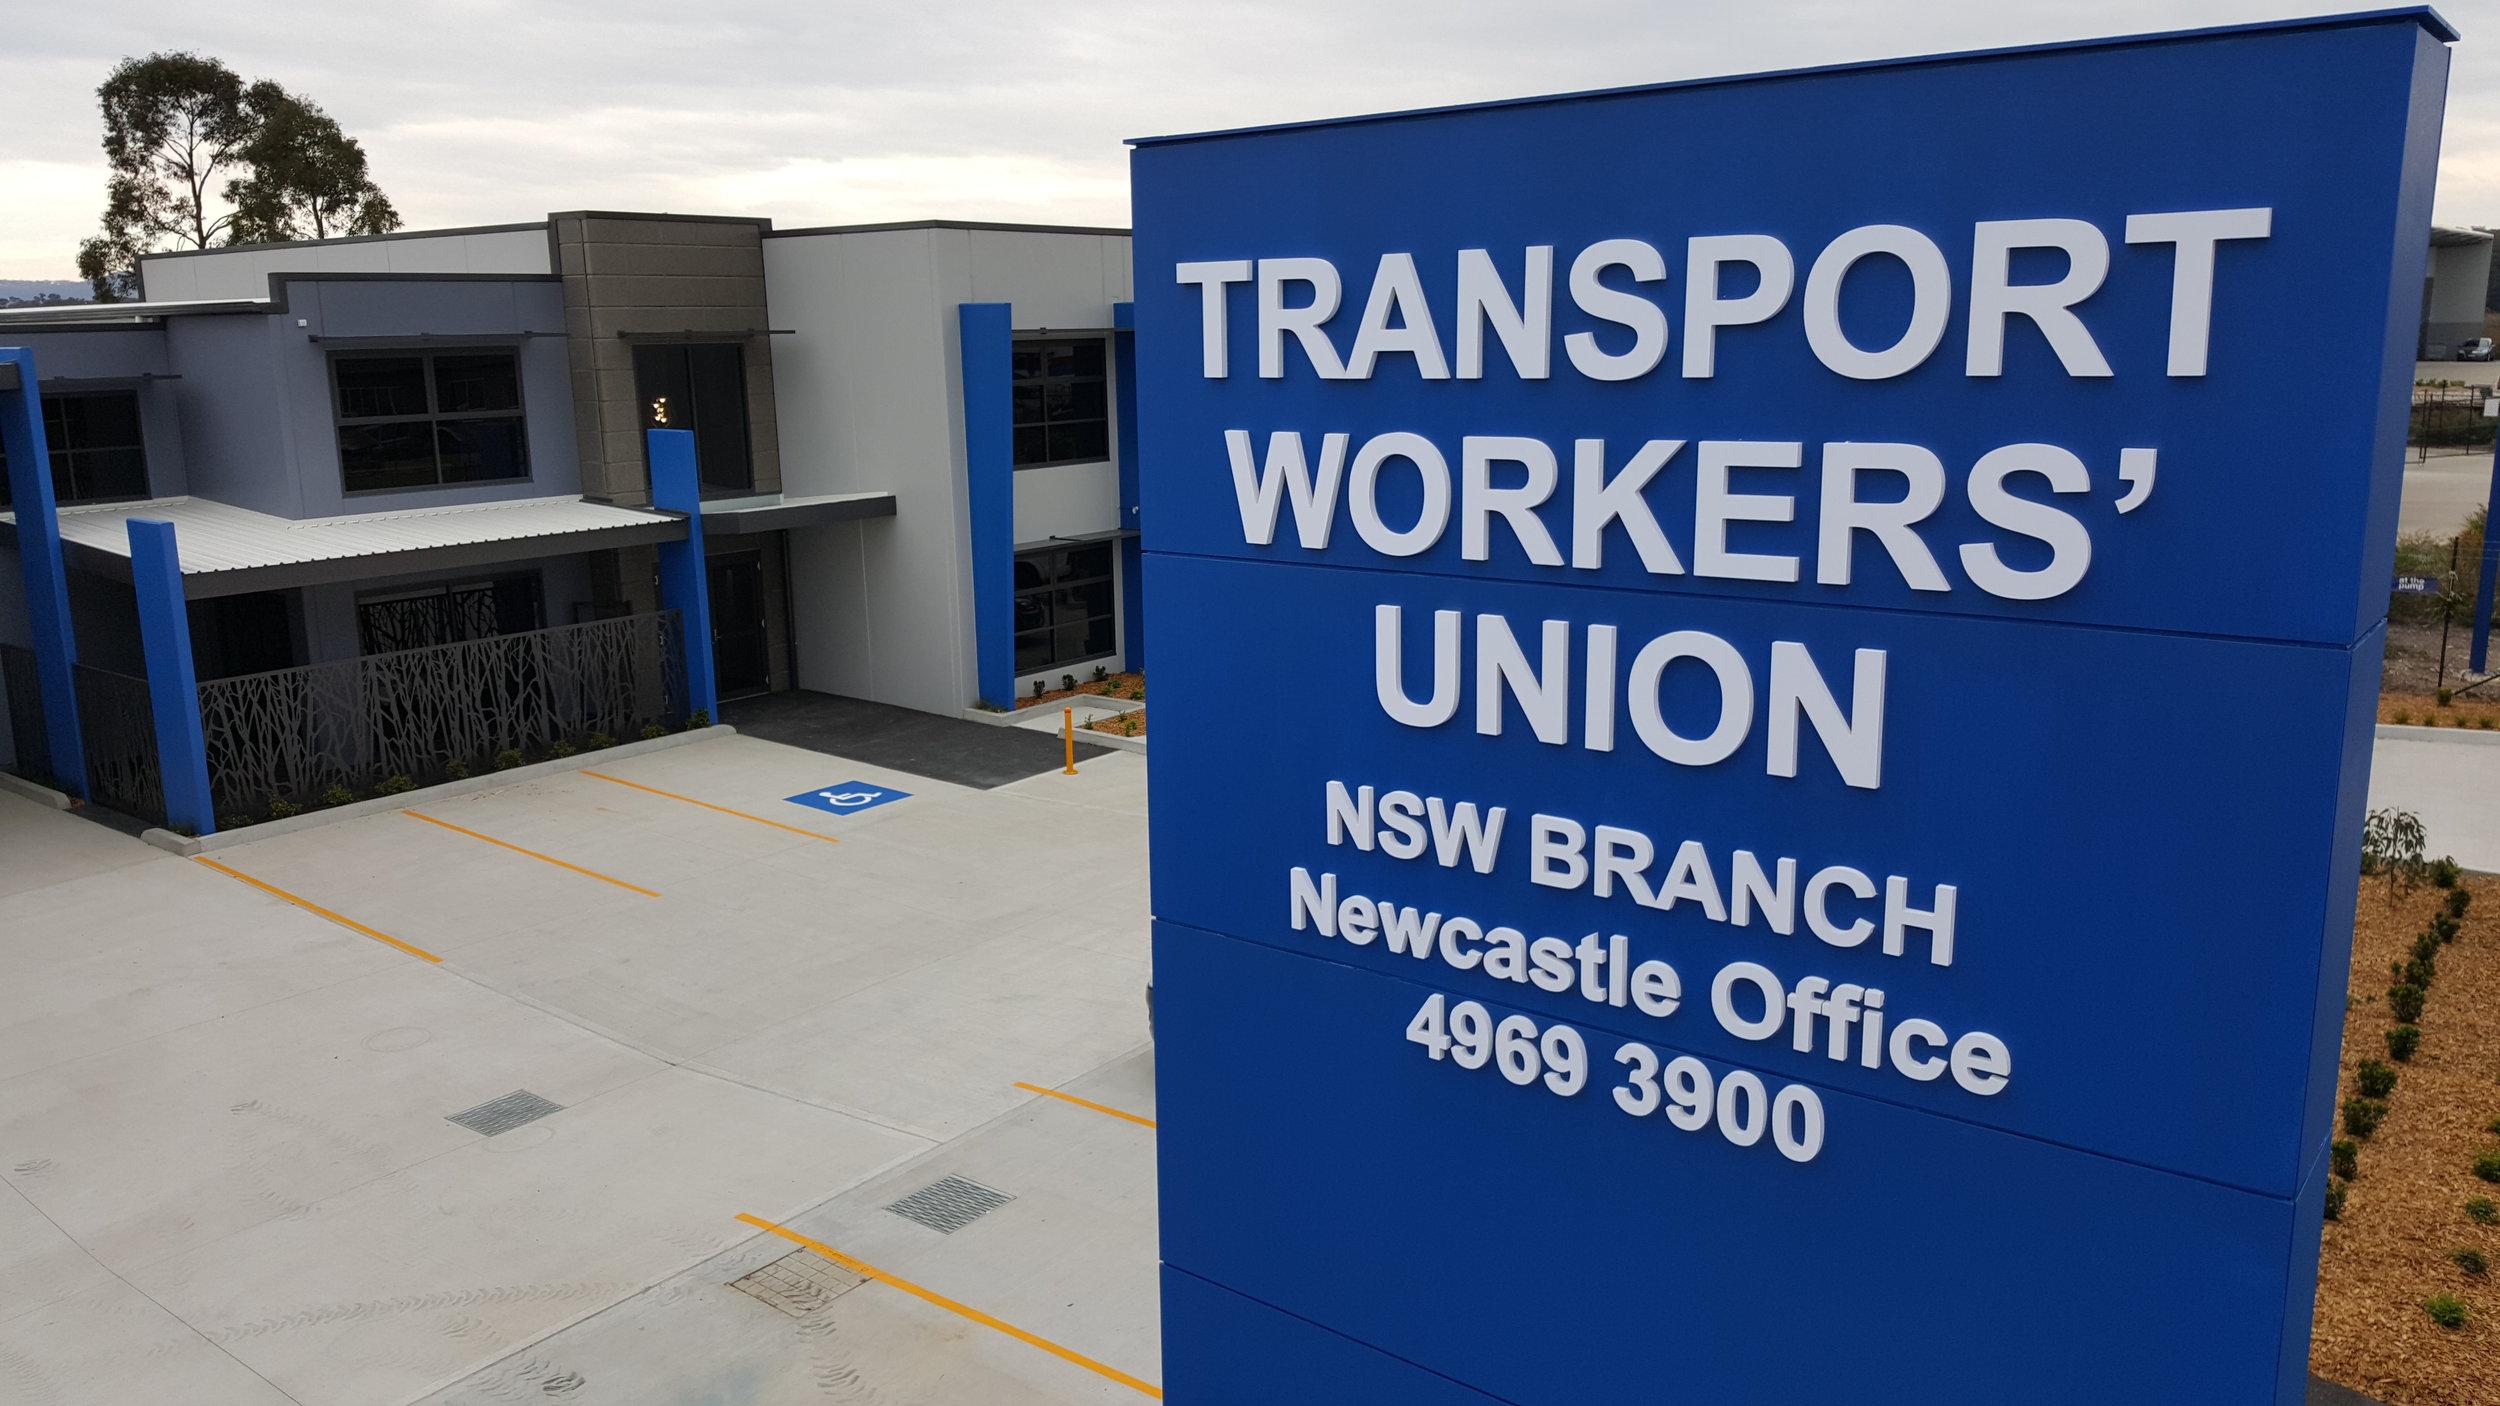 transport workers union pylon sign.jpg